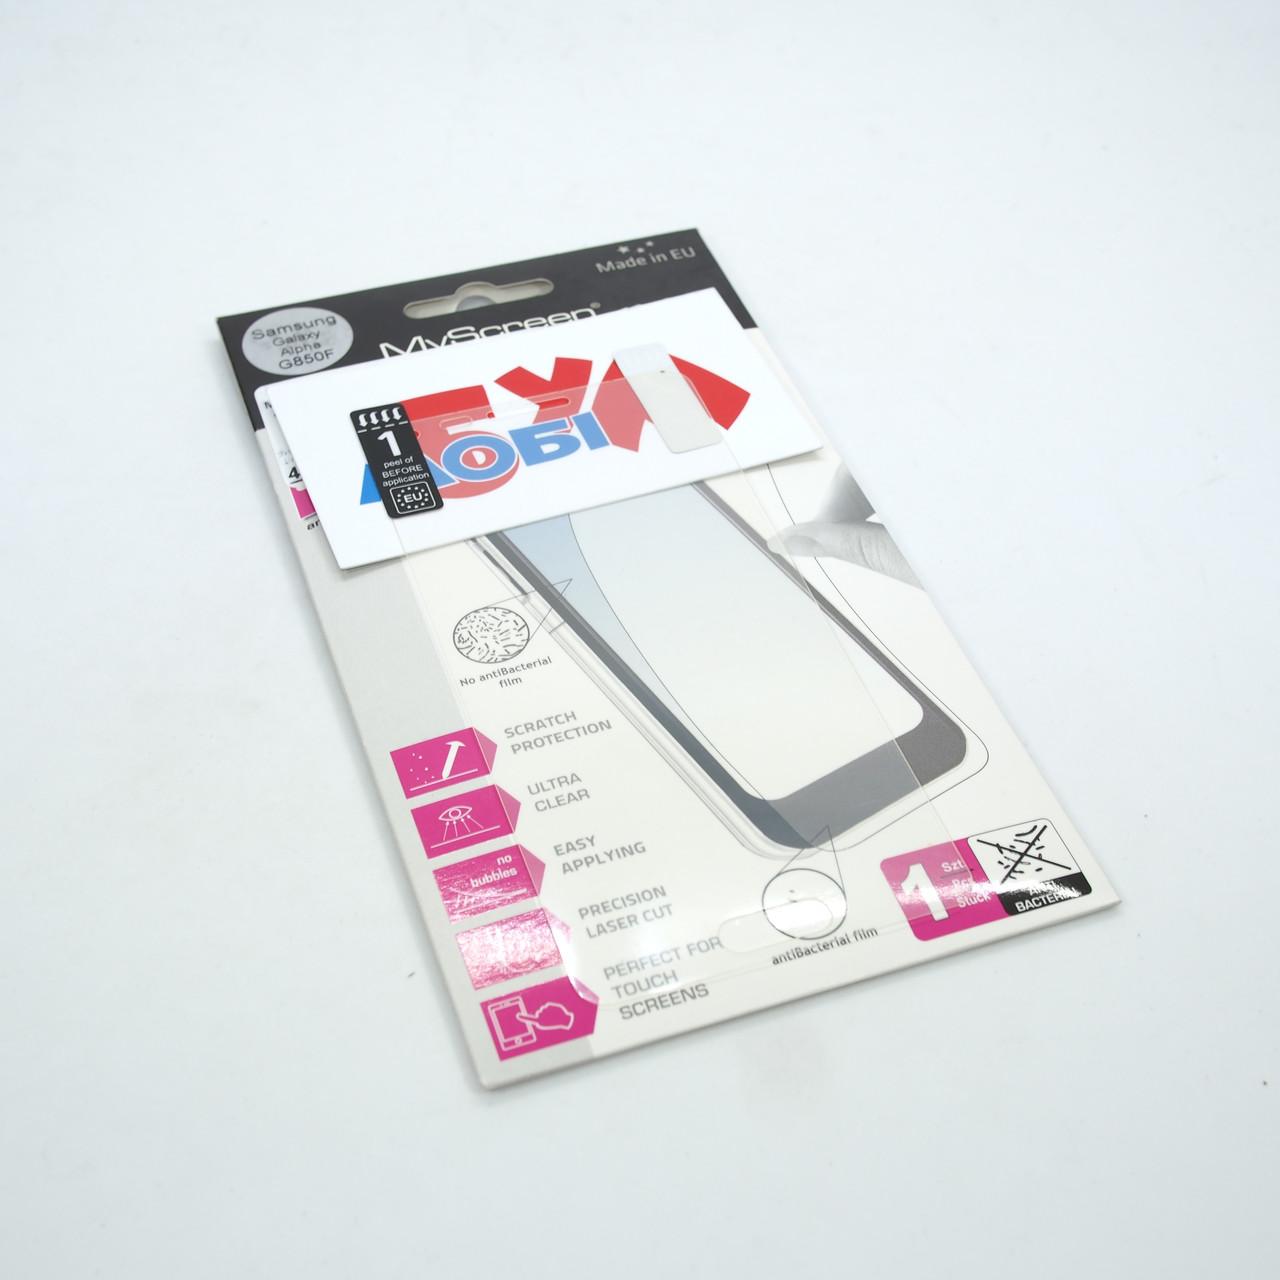 Защитная пленка MyScreen Samsung Galaxy Alpha G850 (G850)